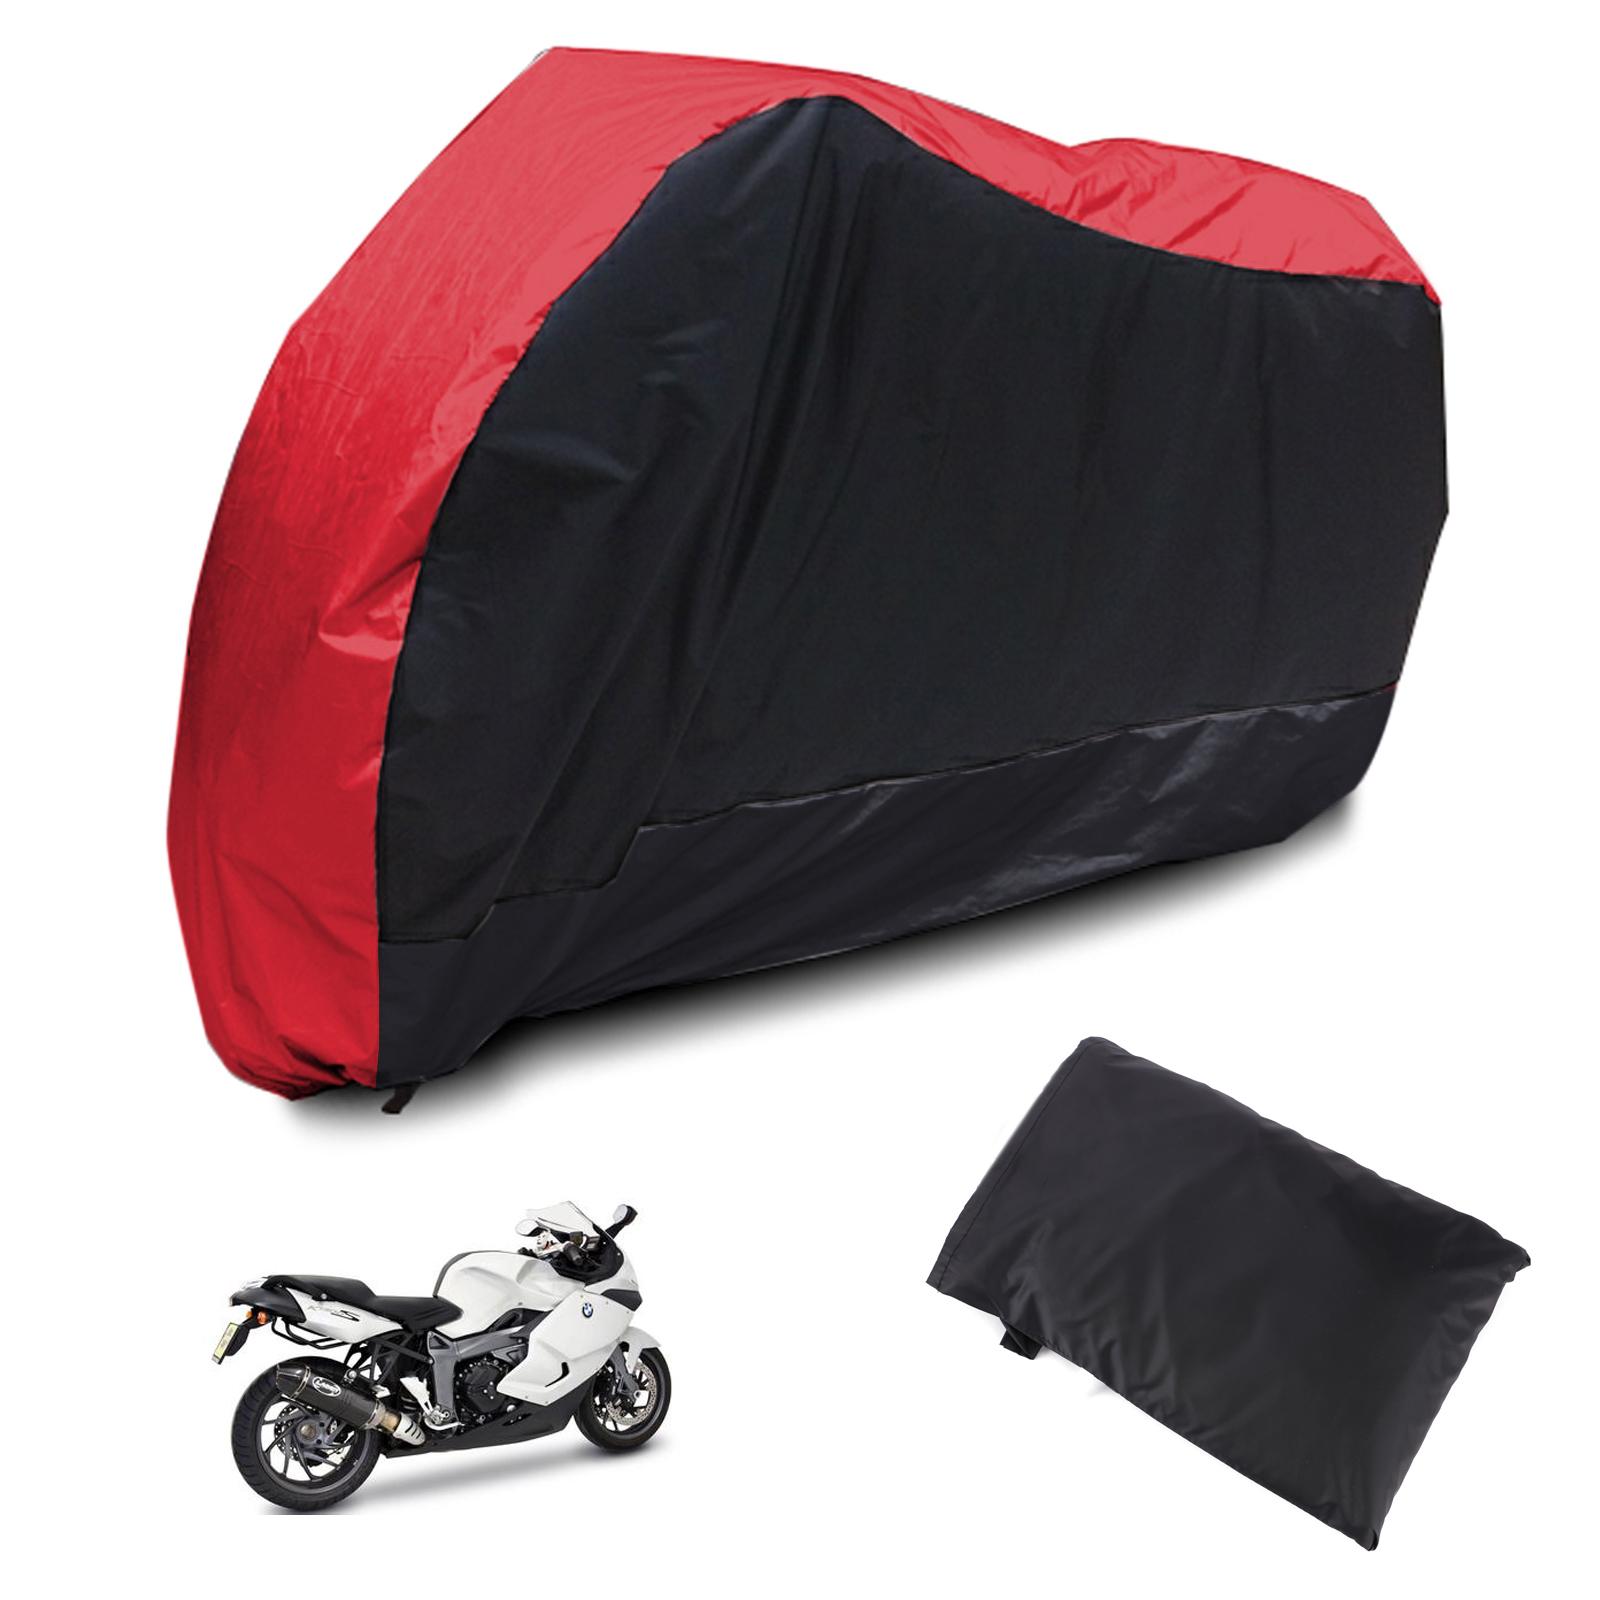 Hamimelon Funda Protectora Impermeable UV para Motocicleta con Bolsa de Transporte Camuflaje Talla XL